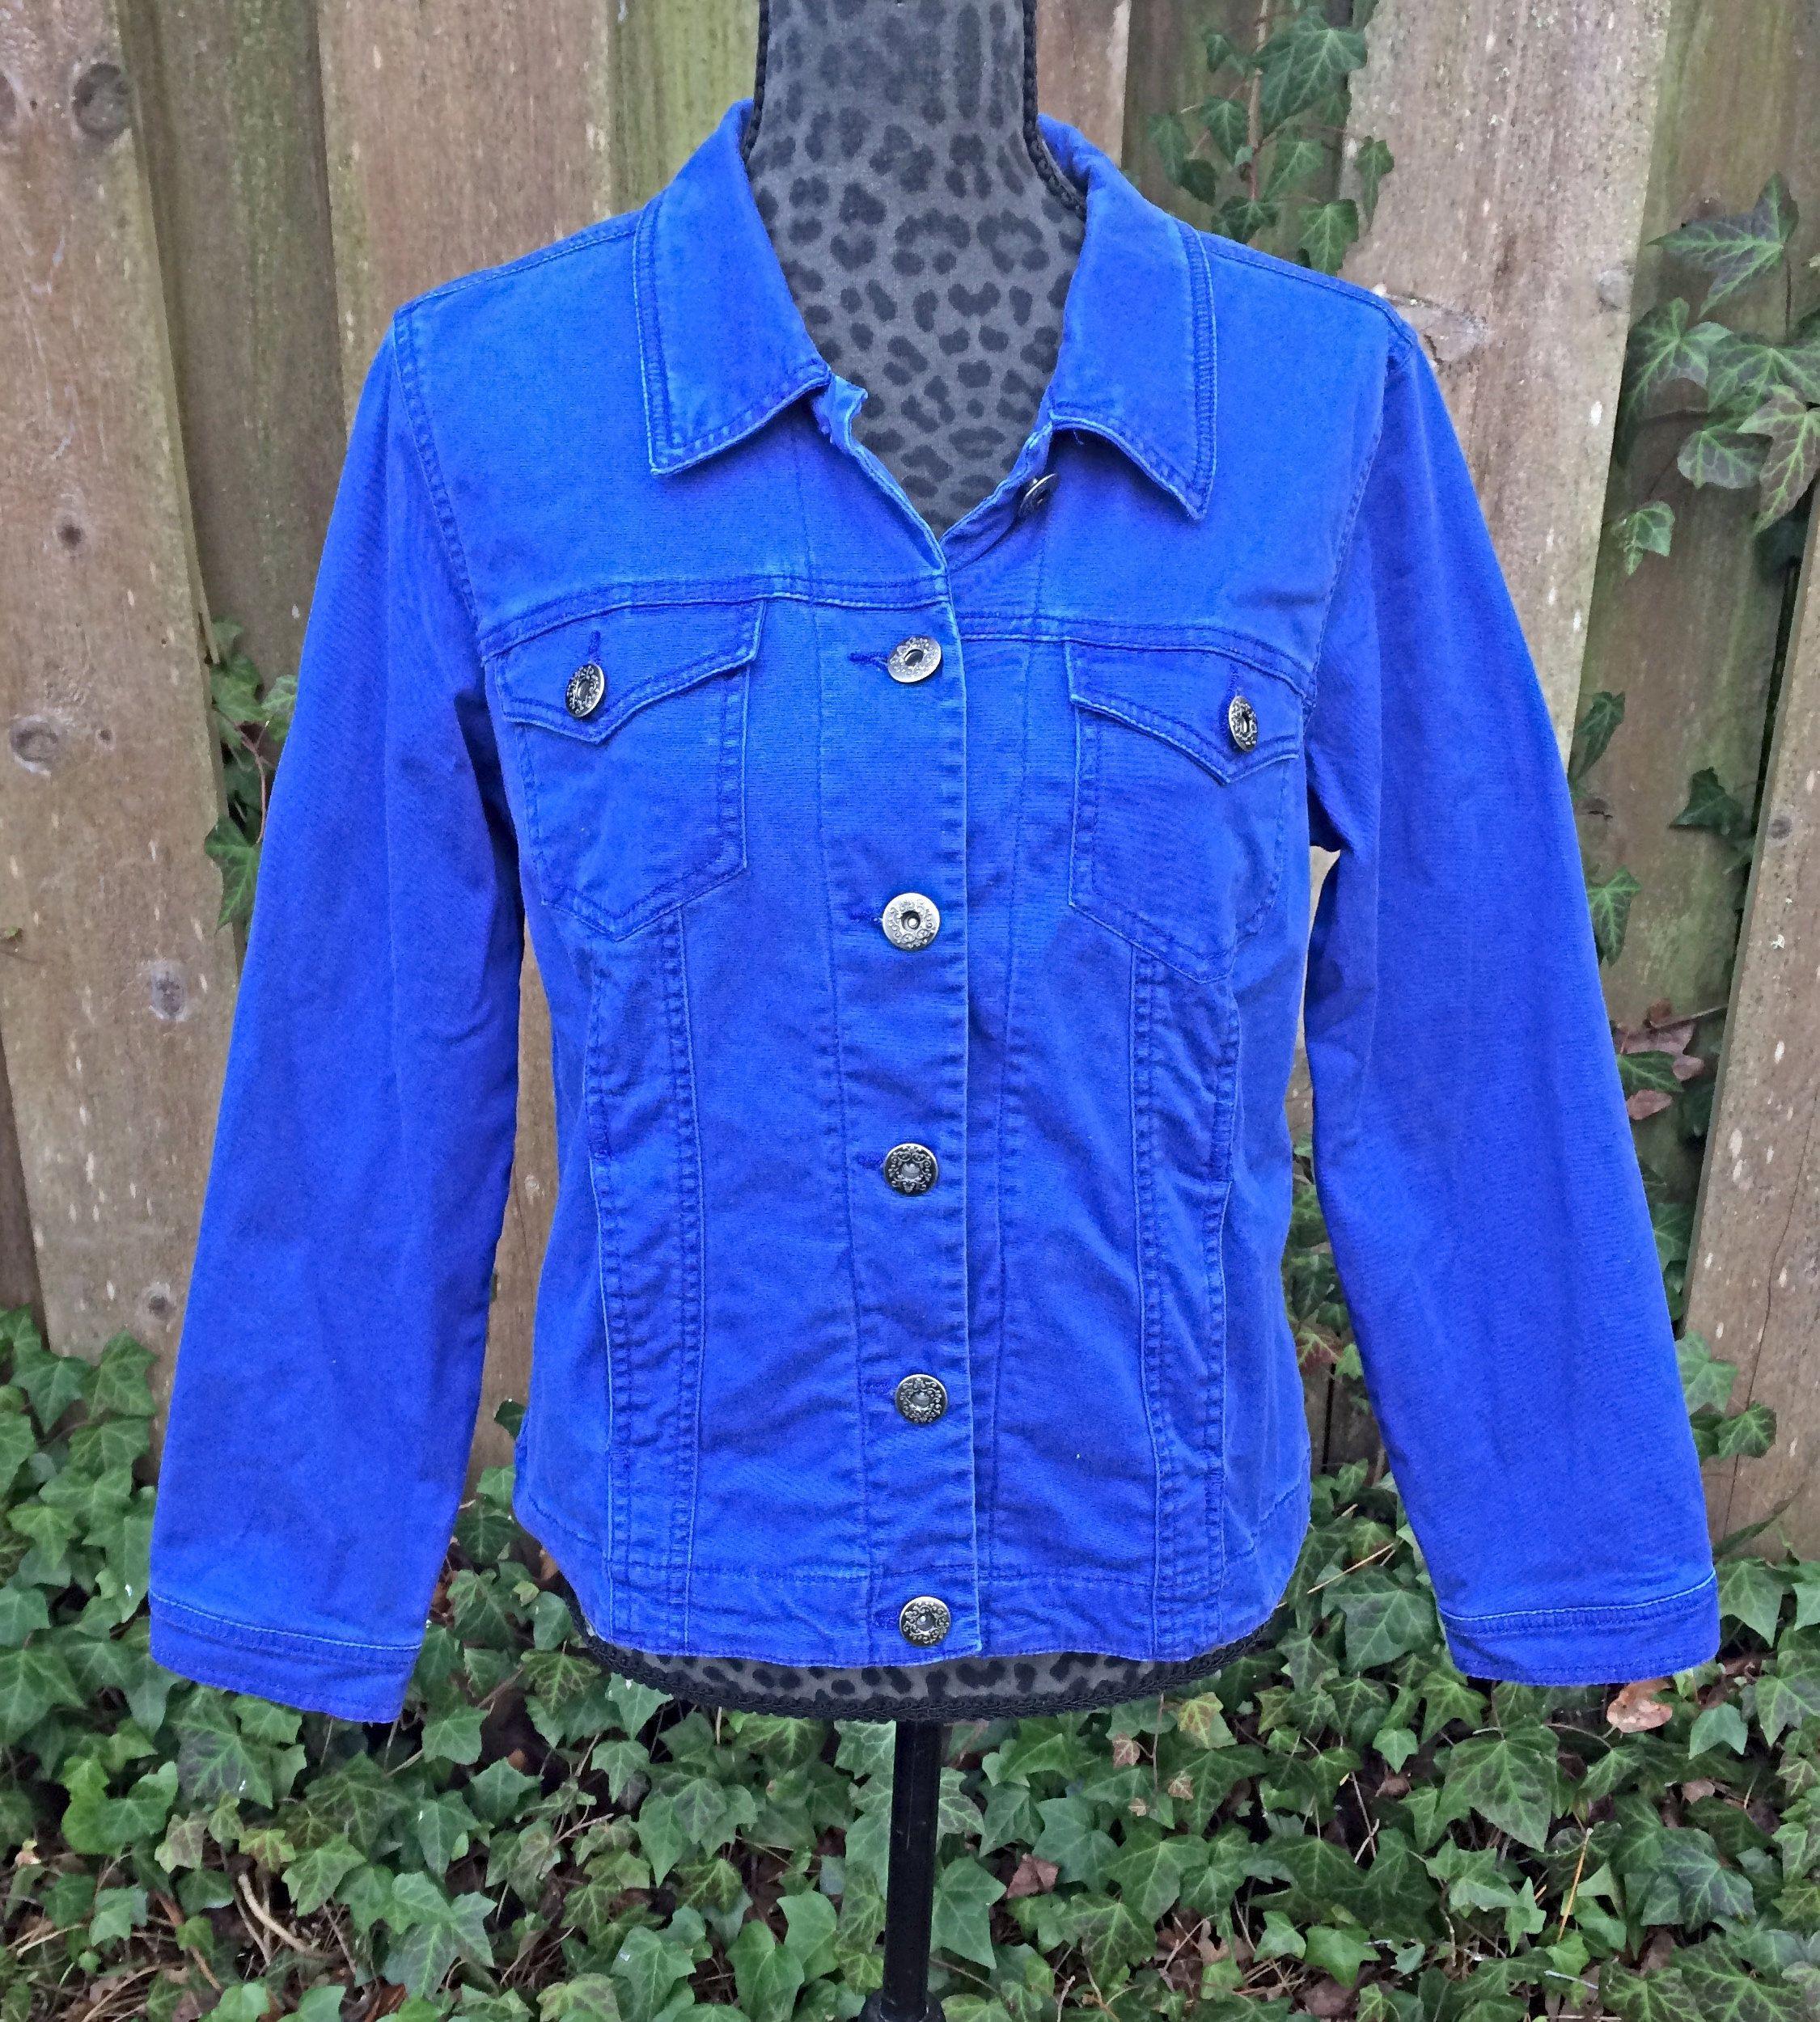 Women S Blue Jean Jacket Vintage Royal Blue Jean Jacket Ladies Blue Coat Blue Jacket True Blue Utilit Blue Jean Jacket Royal Blue Jeans Vintage Jacket [ 2500 x 2250 Pixel ]